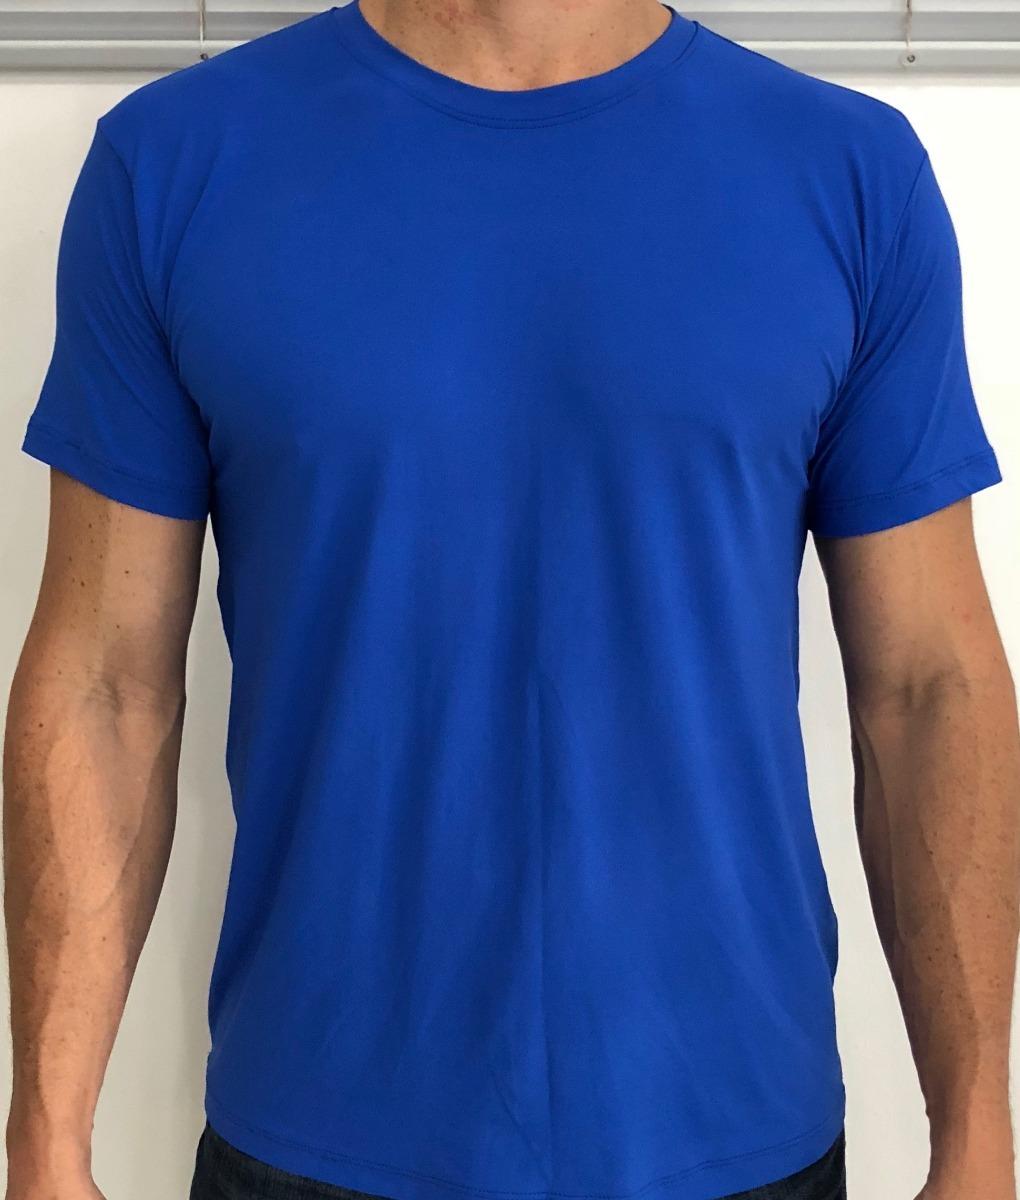 Kit 5 Unidades - Camiseta Dry Fit 100% Poliamida Malha Leve - R  138 ... ecbc01621d820